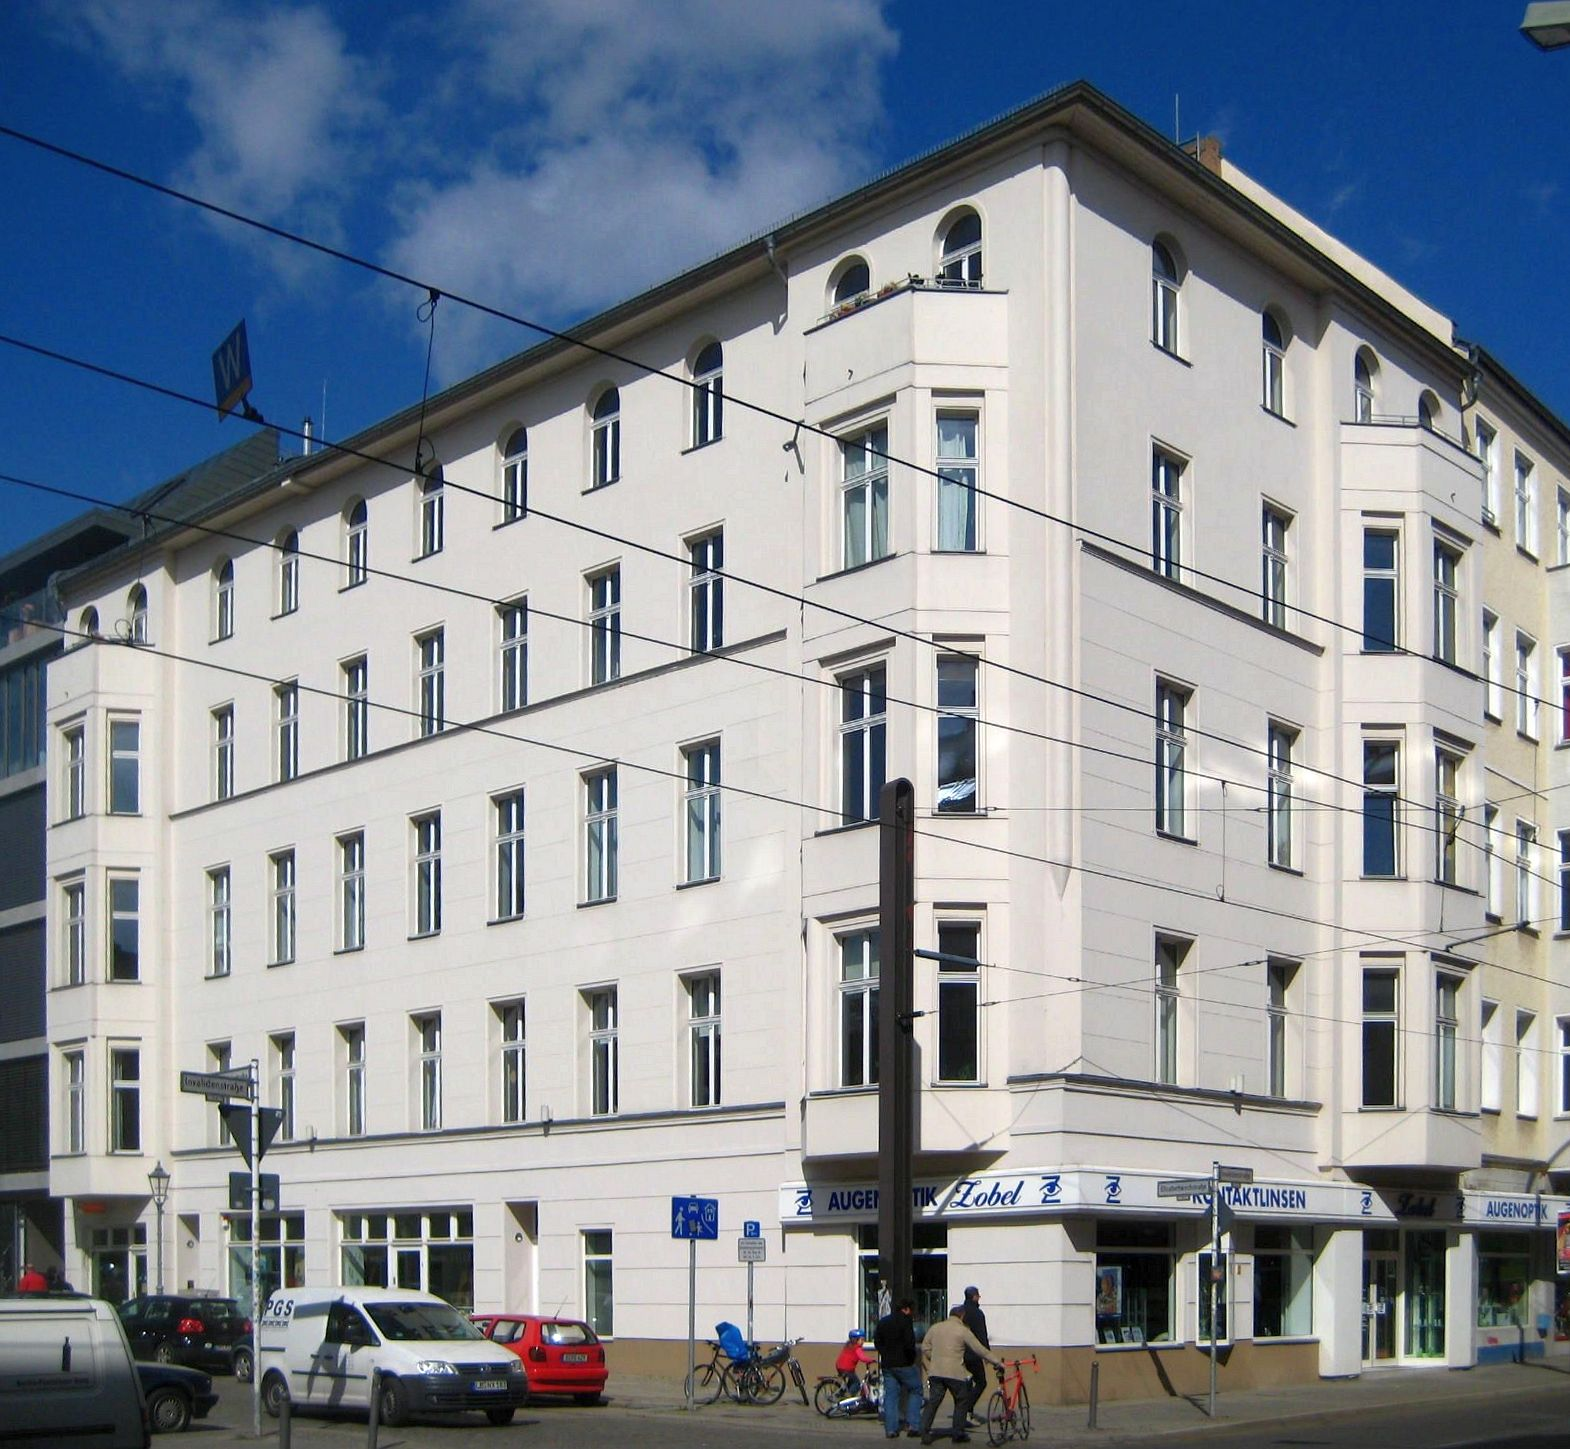 Berlin Invalidenstraße